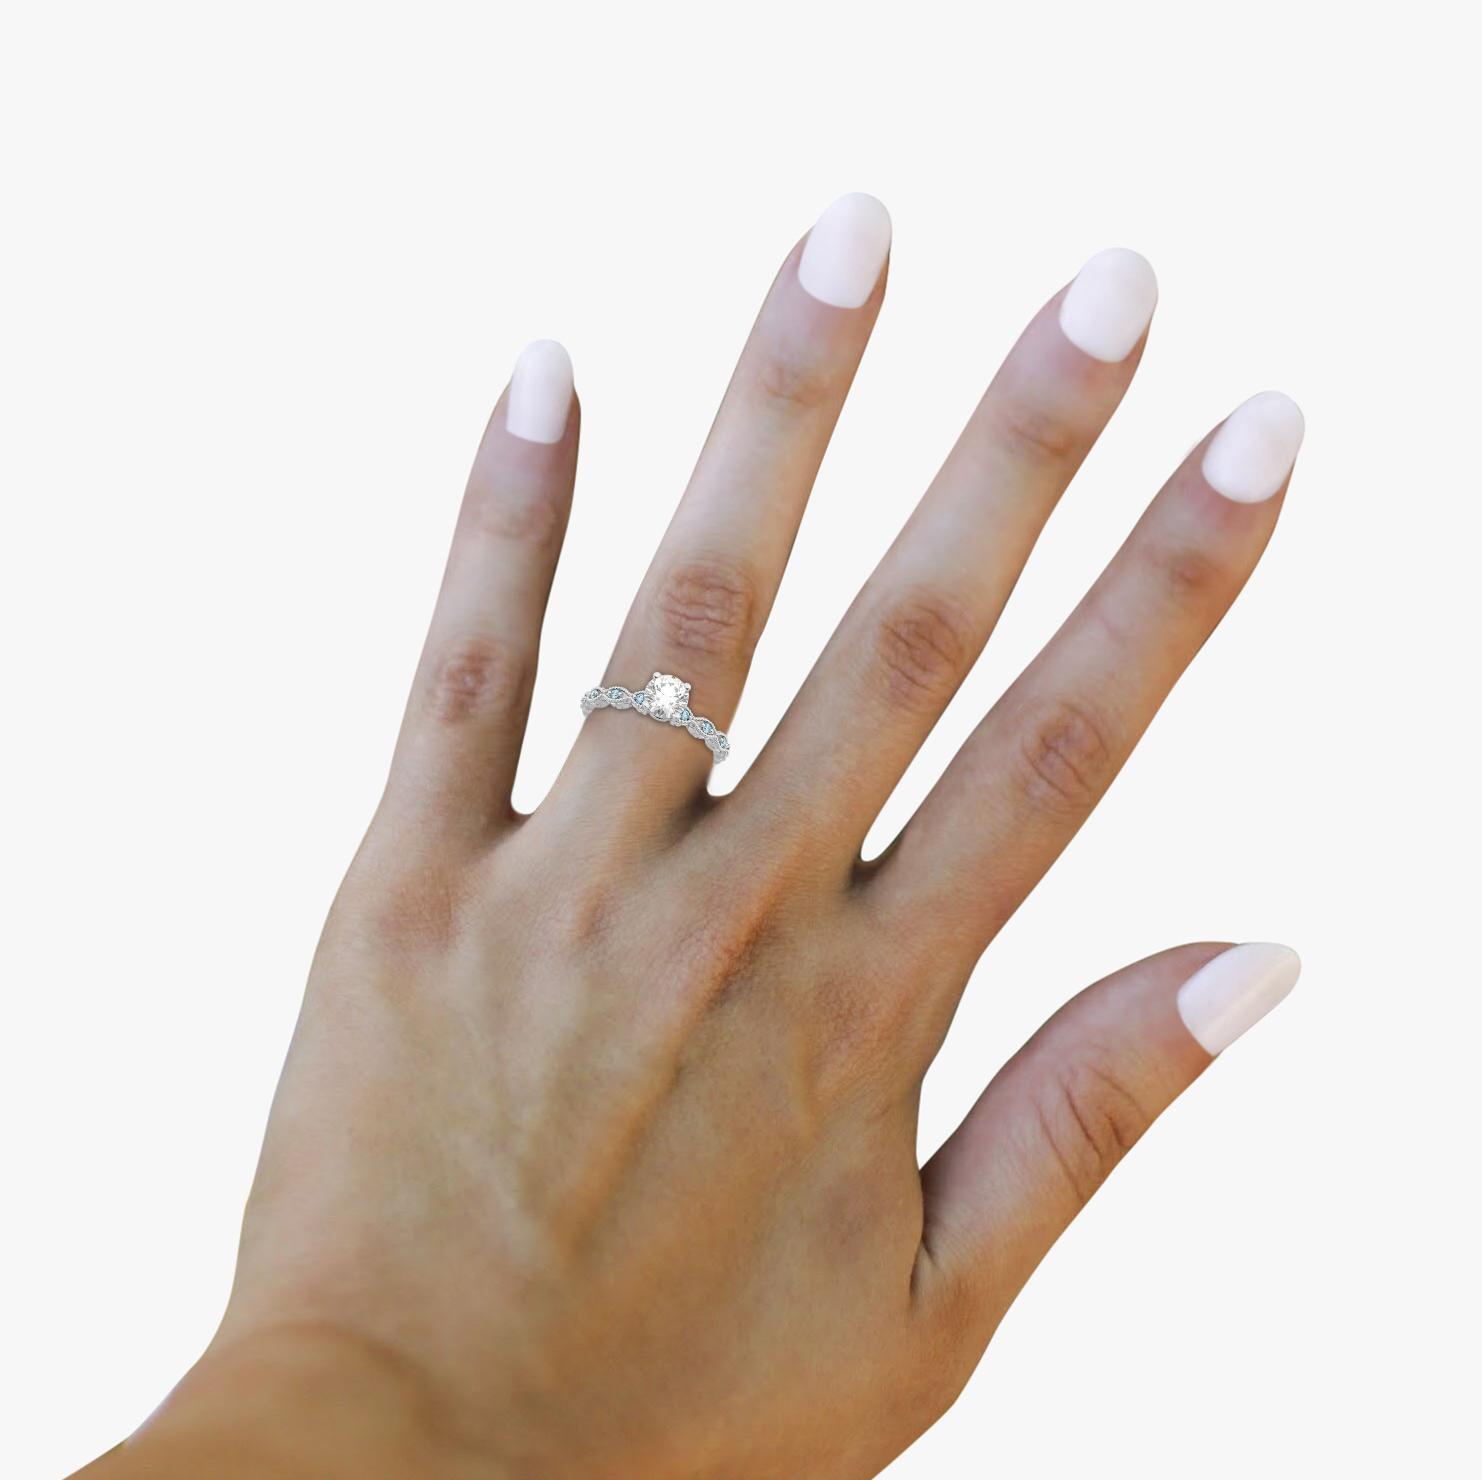 Vintage Marquise Aquamarine Engagement Ring 18k White Gold (0.18ct)